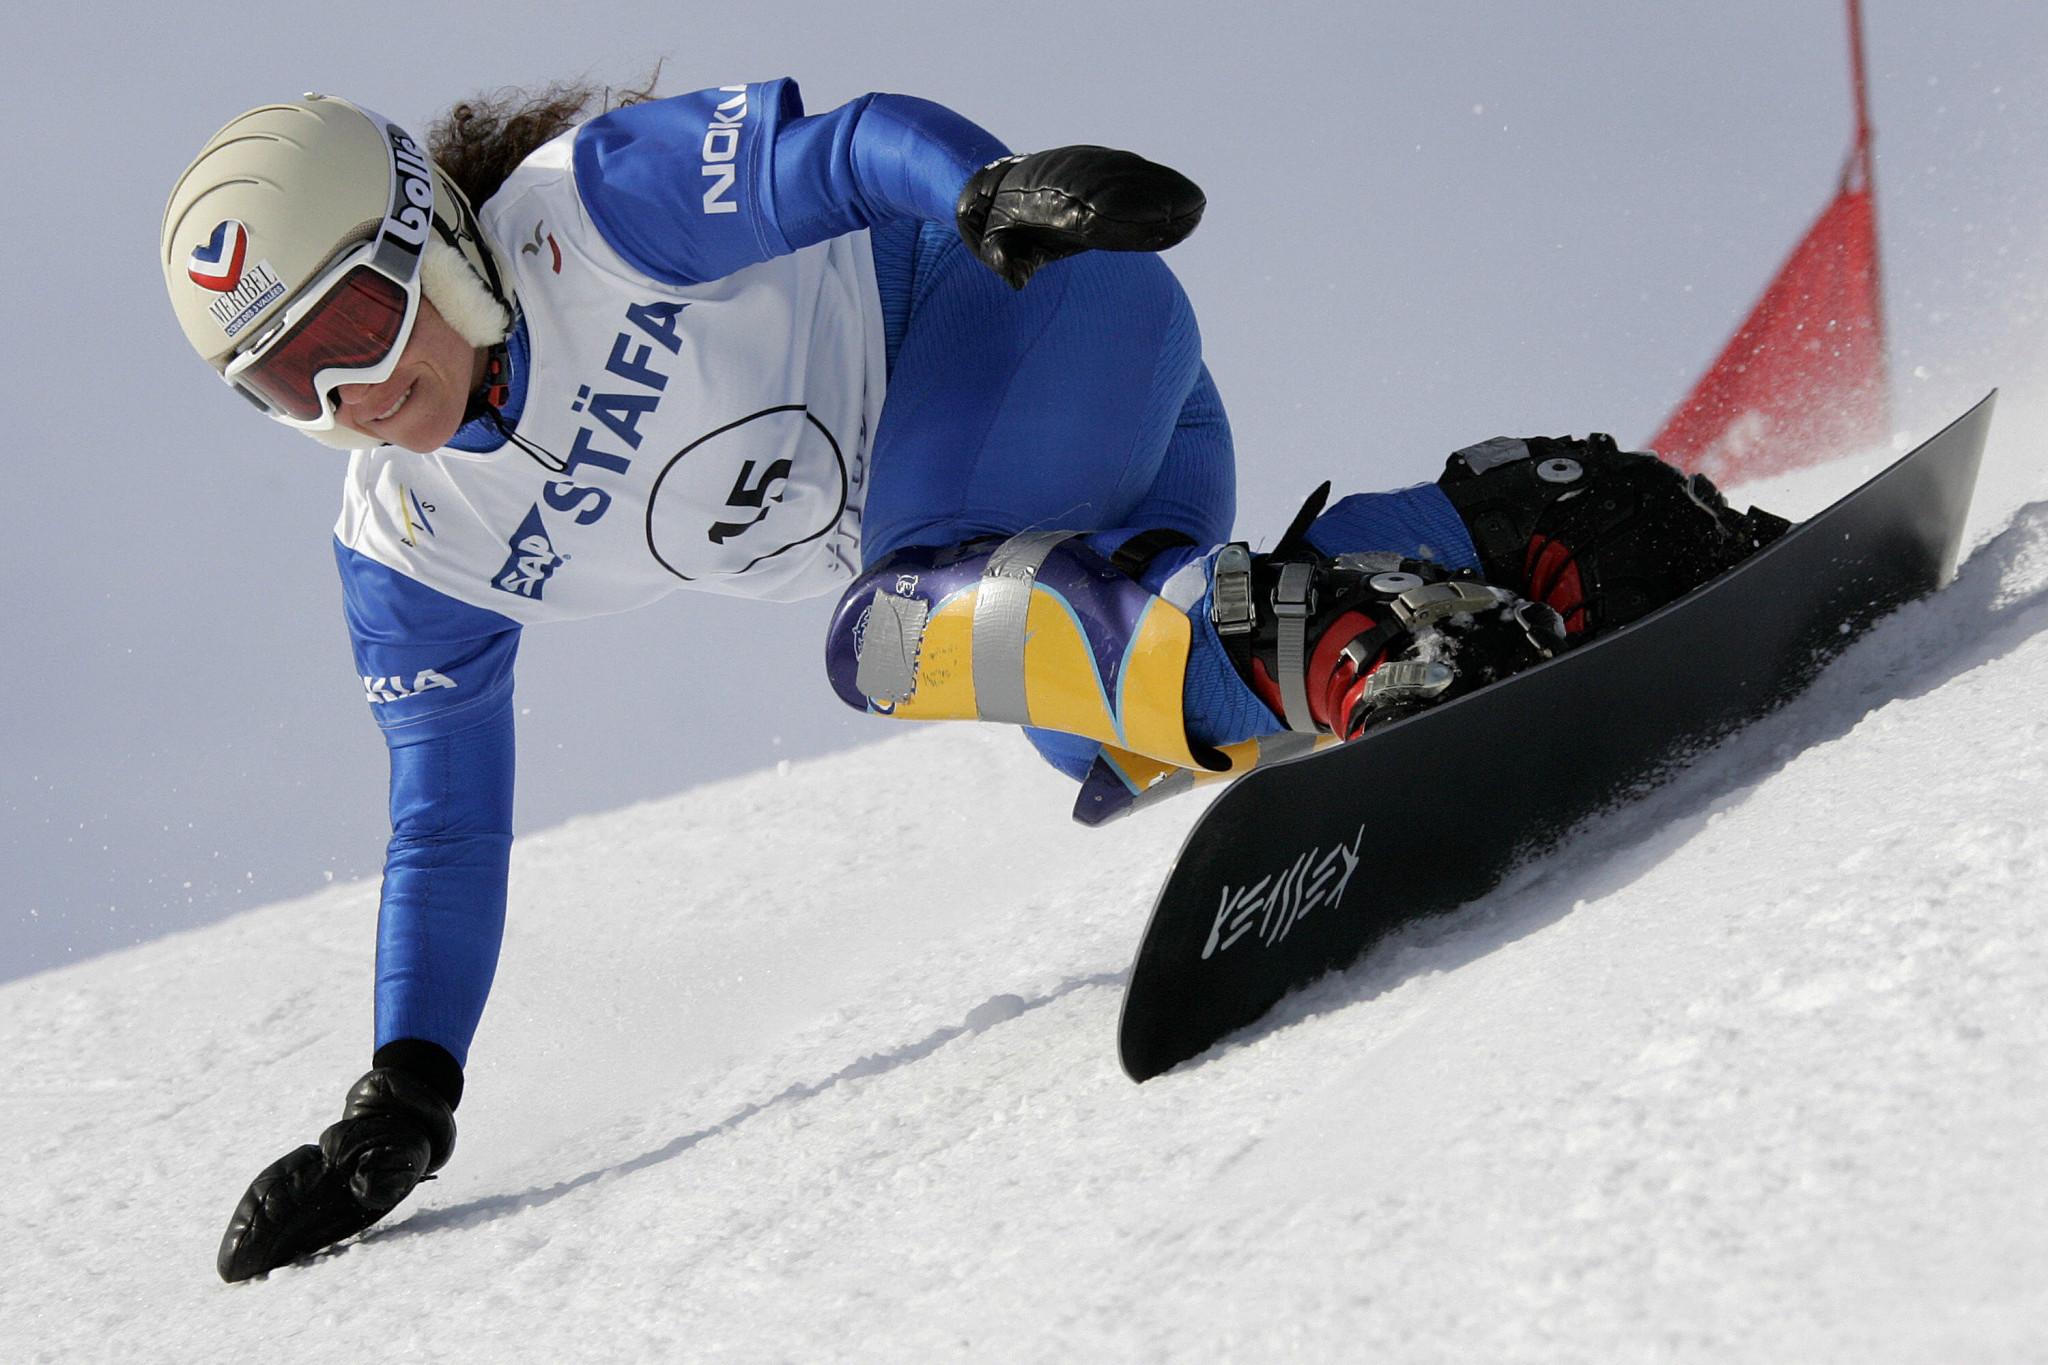 Former snowboard world champion Pomagalski dies in avalanche